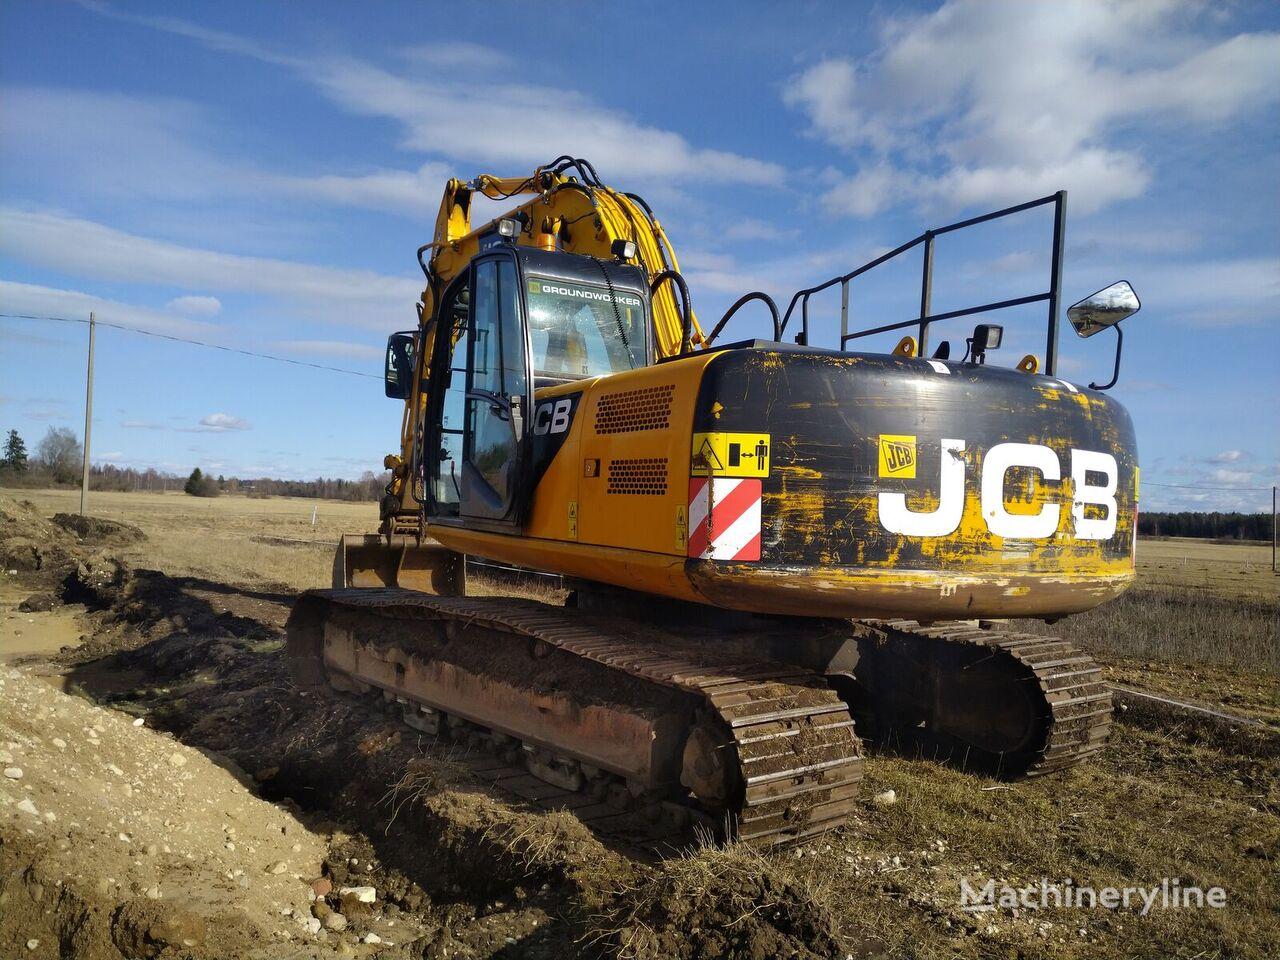 JCB JCB JS220 tracked excavator